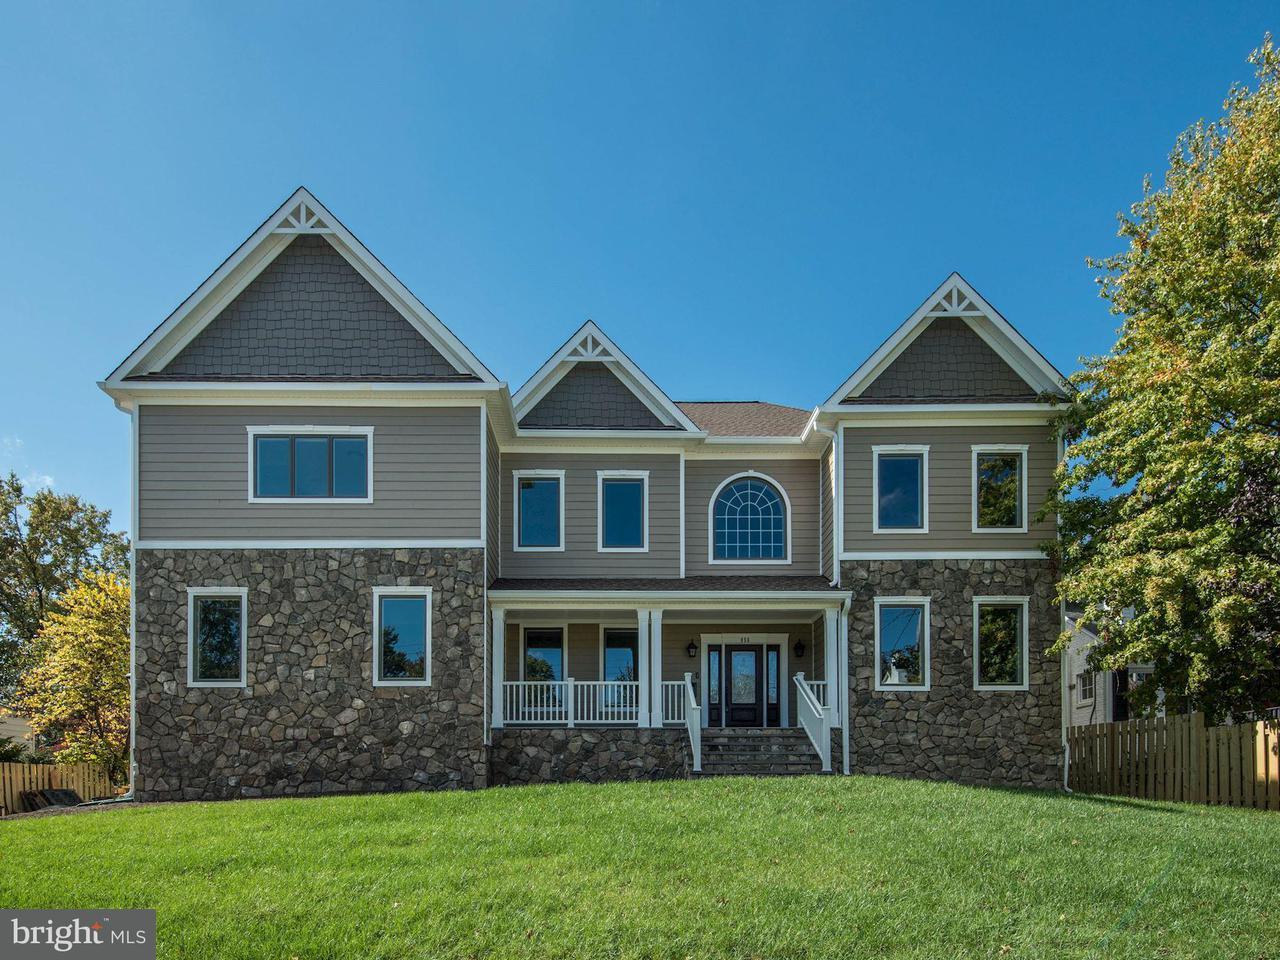 Single Family Home for Sale at 856 Harrison St N 856 Harrison St N Arlington, Virginia 22205 United States